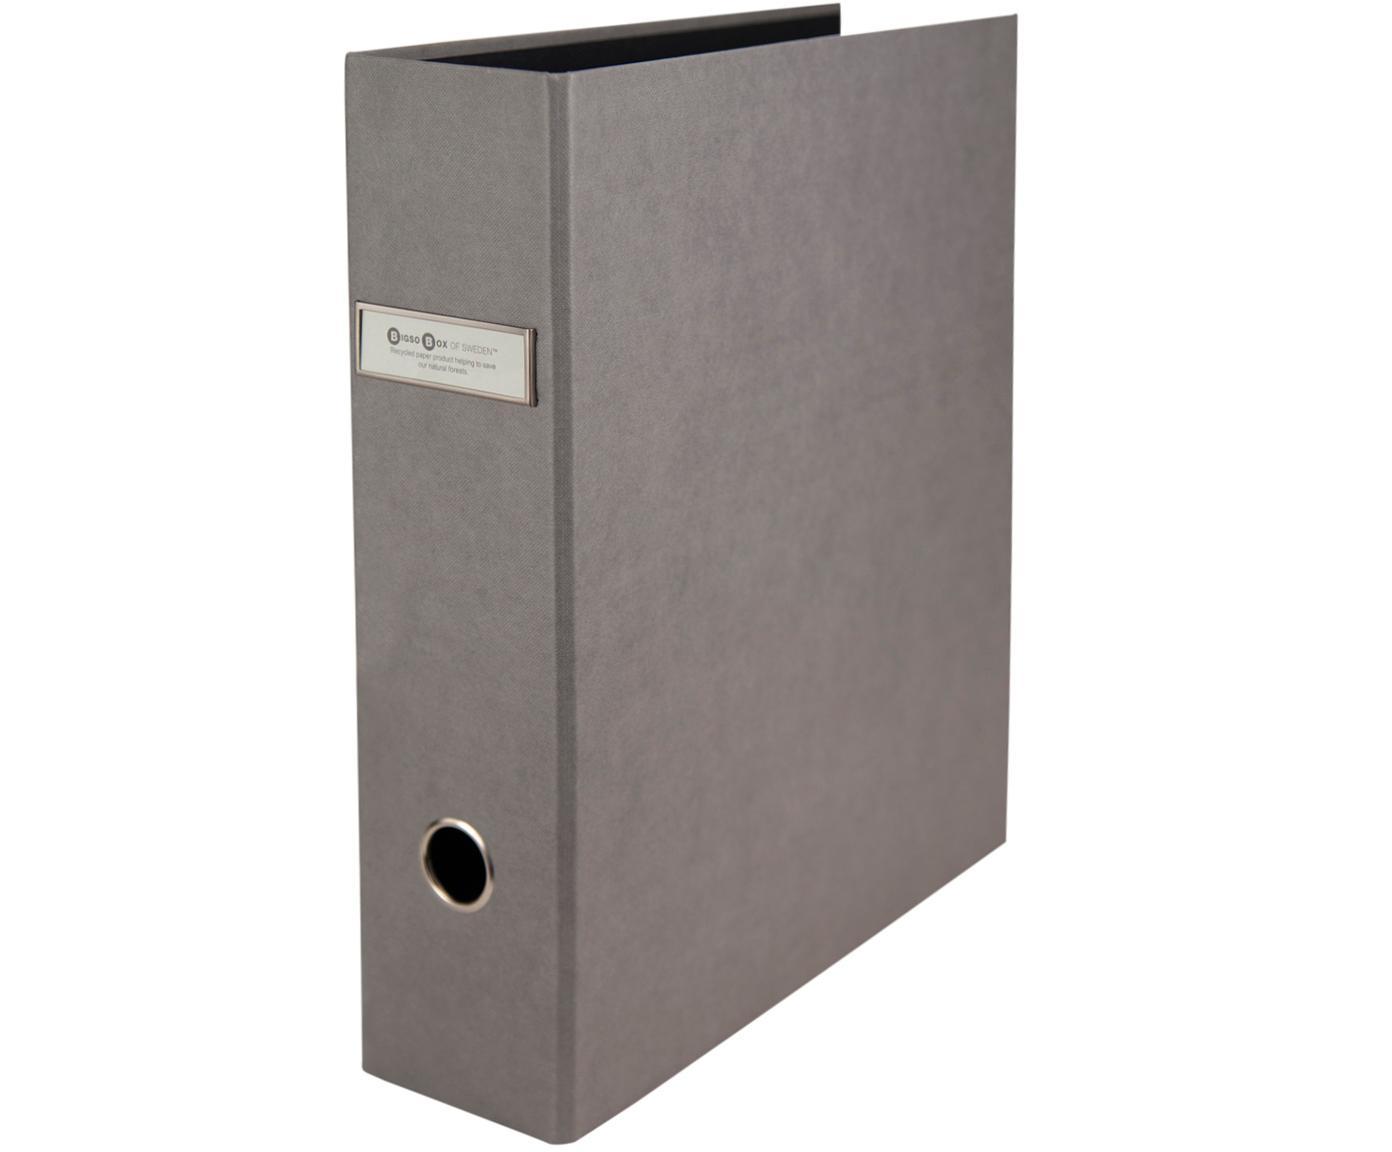 Dokumentenordner Archie, 2Stück, Grau, 29 x 32 cm